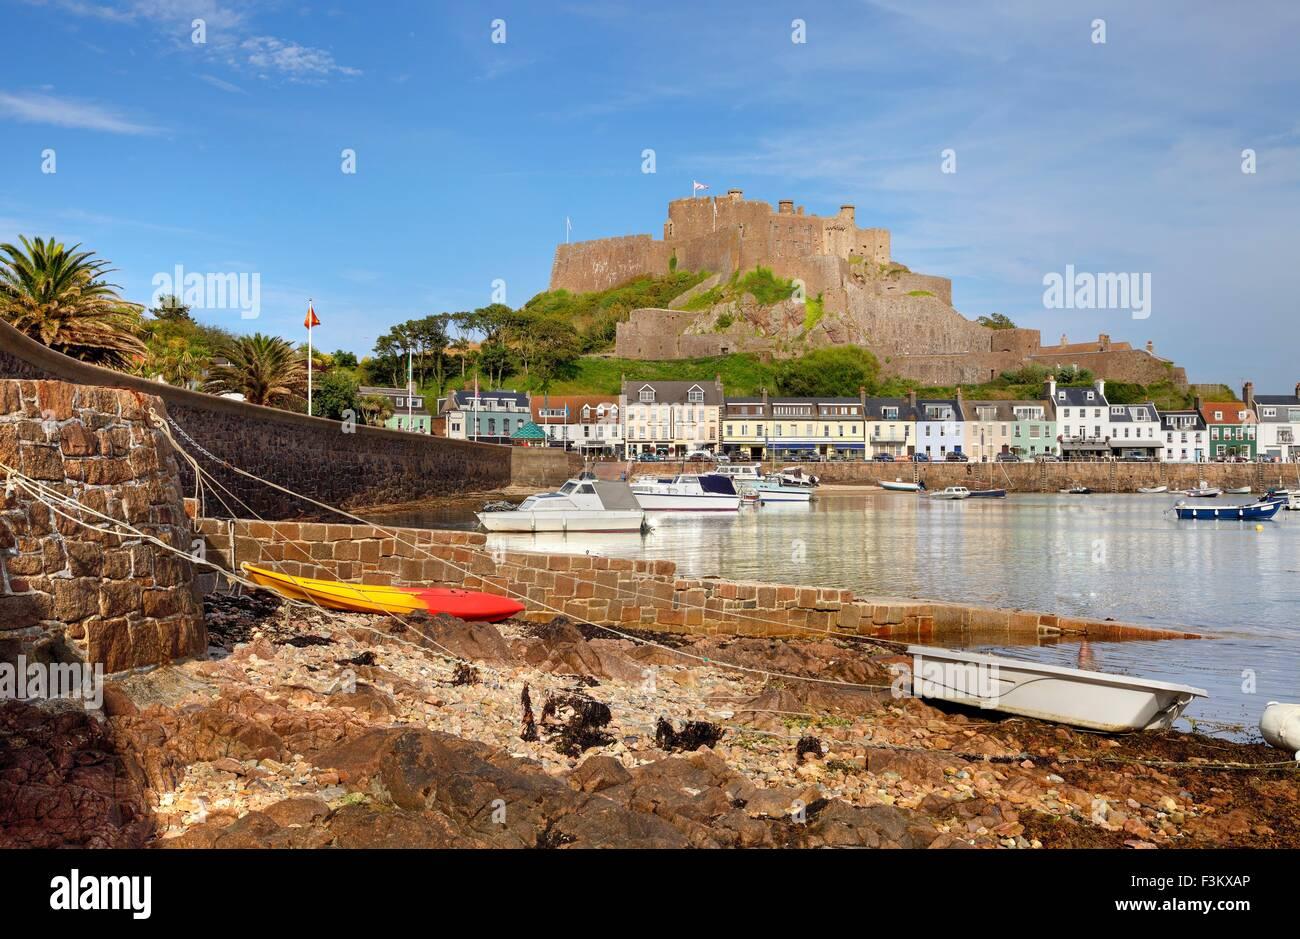 Mont Orgueil Castle at Gorey, Jersey, Channel Islands, Great Britain - Stock Image